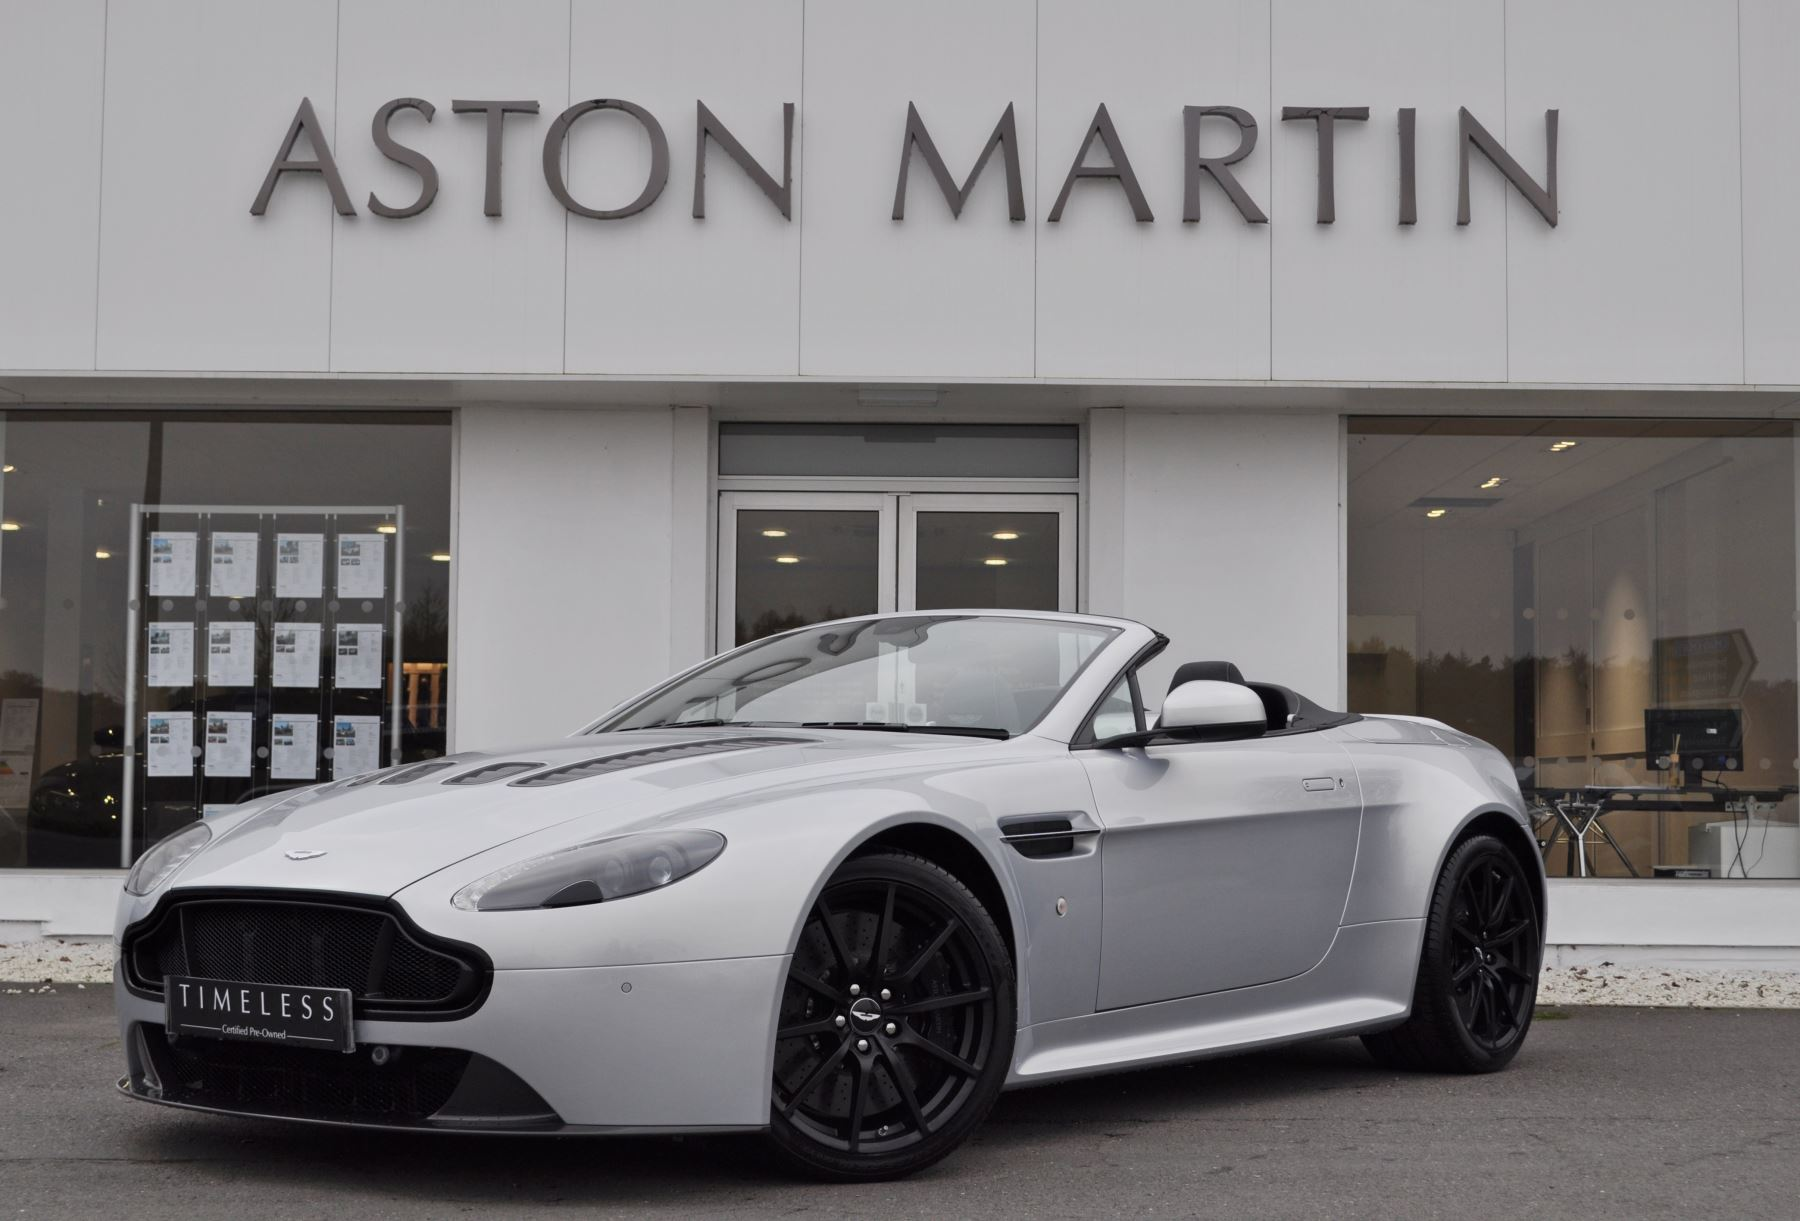 Aston Martin V12 Vantage S S 2dr Sportshift III image 1